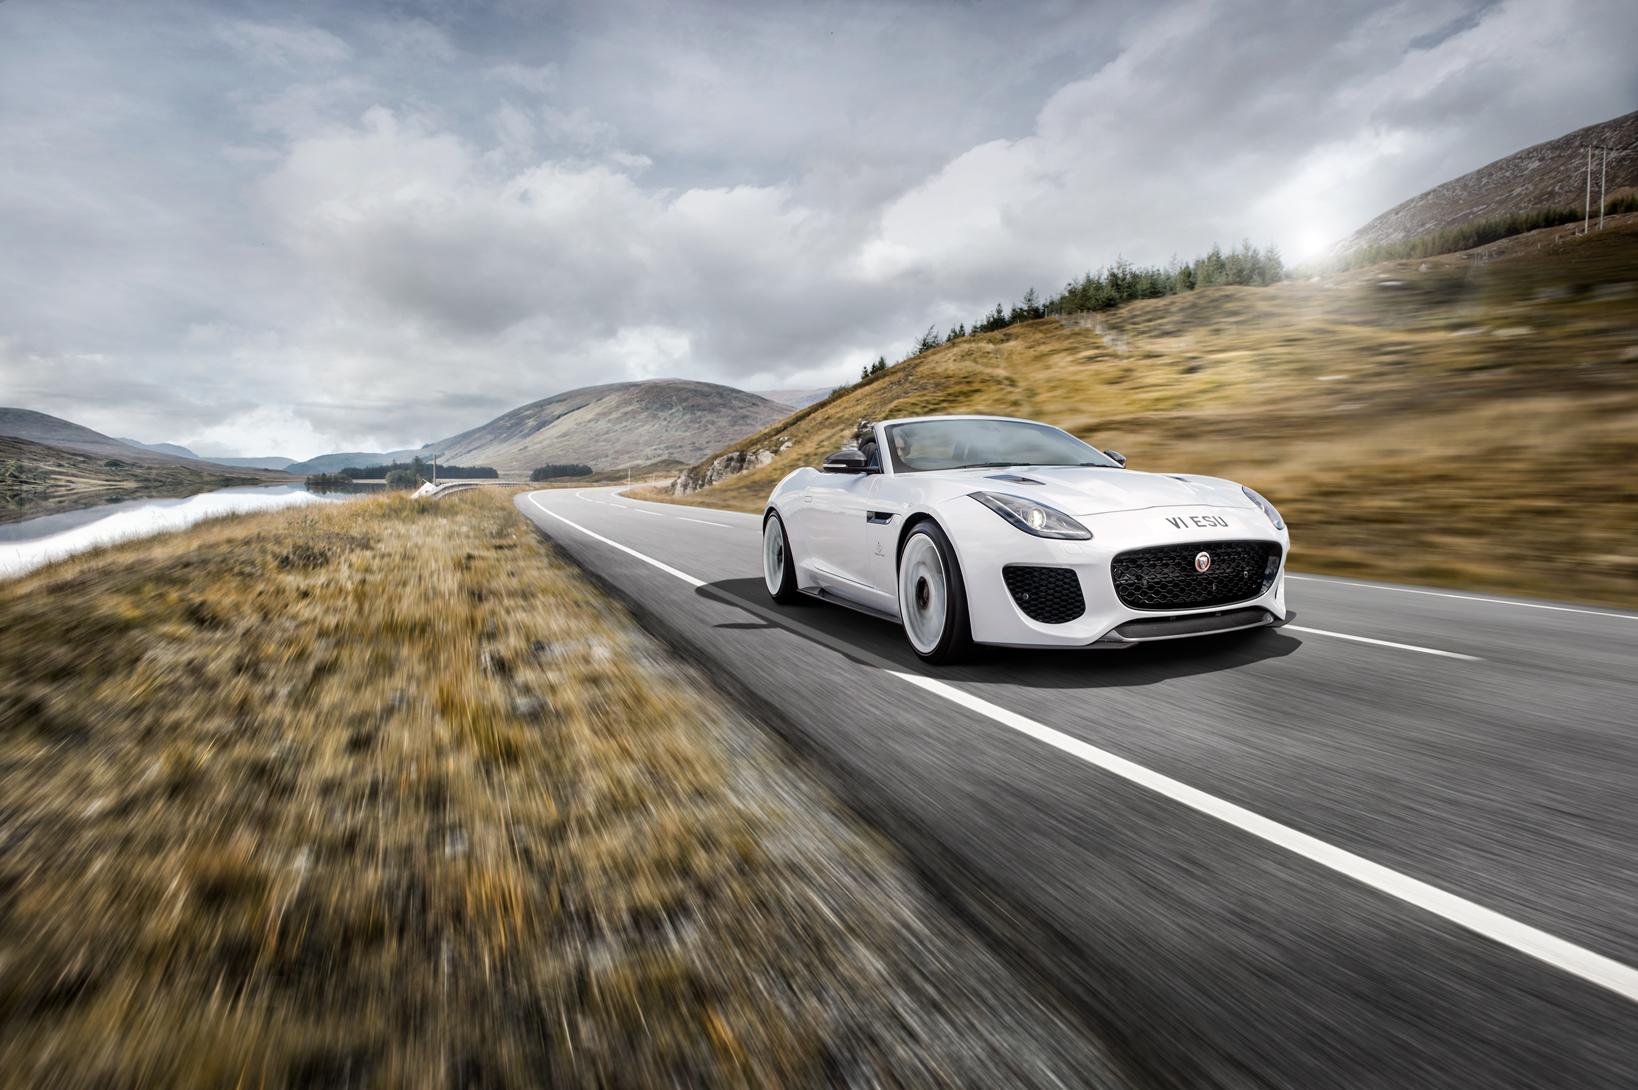 VIP Design Supercar Jaguar F-Type Upgrade